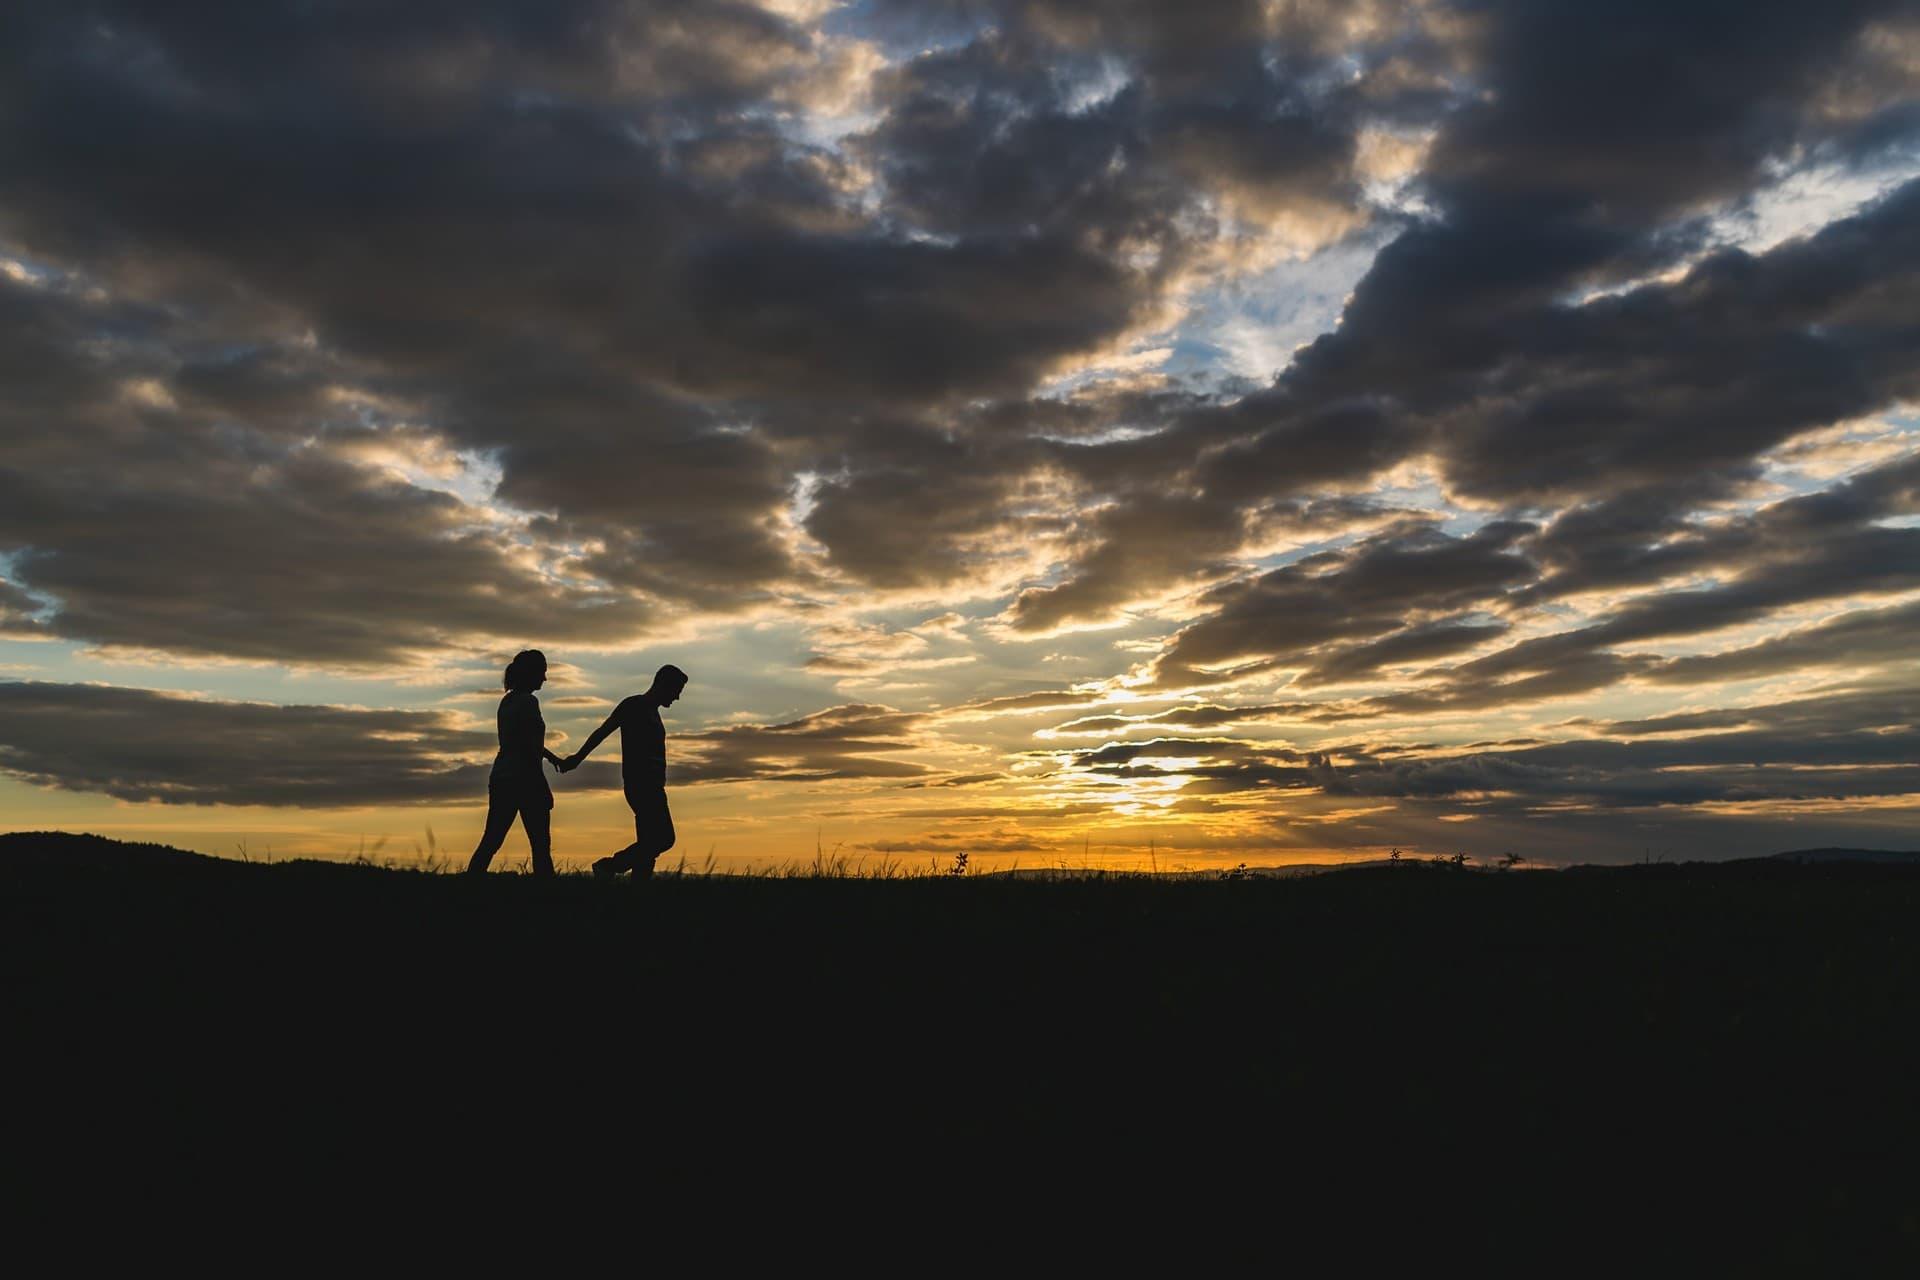 kennenlernshooting paar im sonnenuntergang